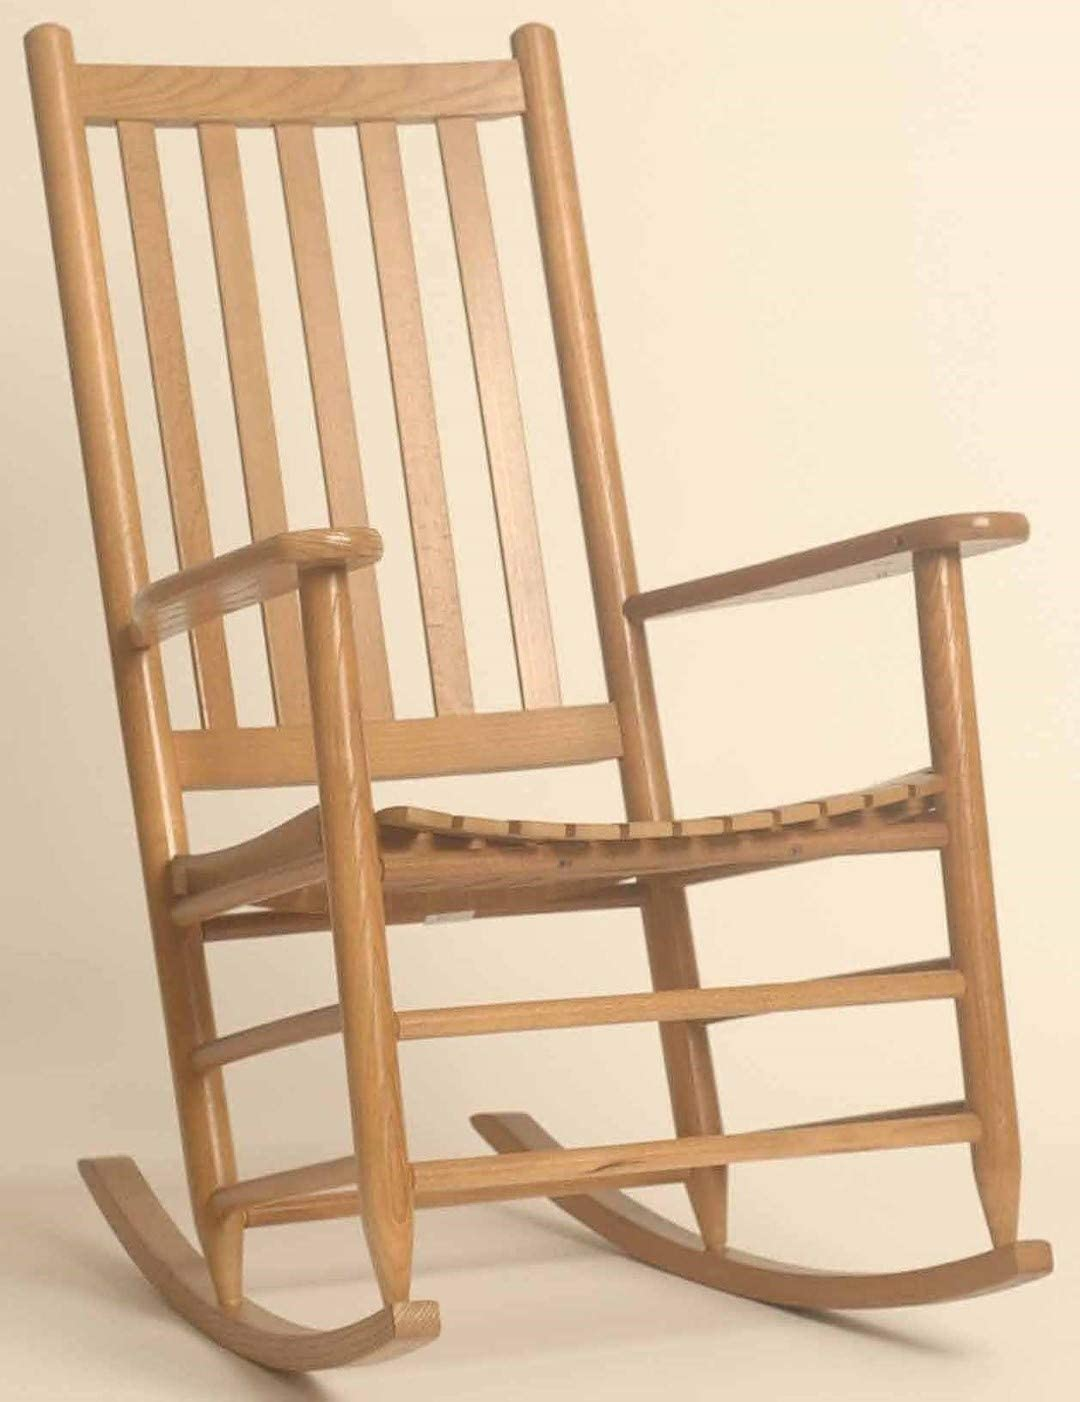 Dixie Seating Asheville Wood Adult Rocking Chair No. 95SRTA Coastal Purple Woodleaf Green